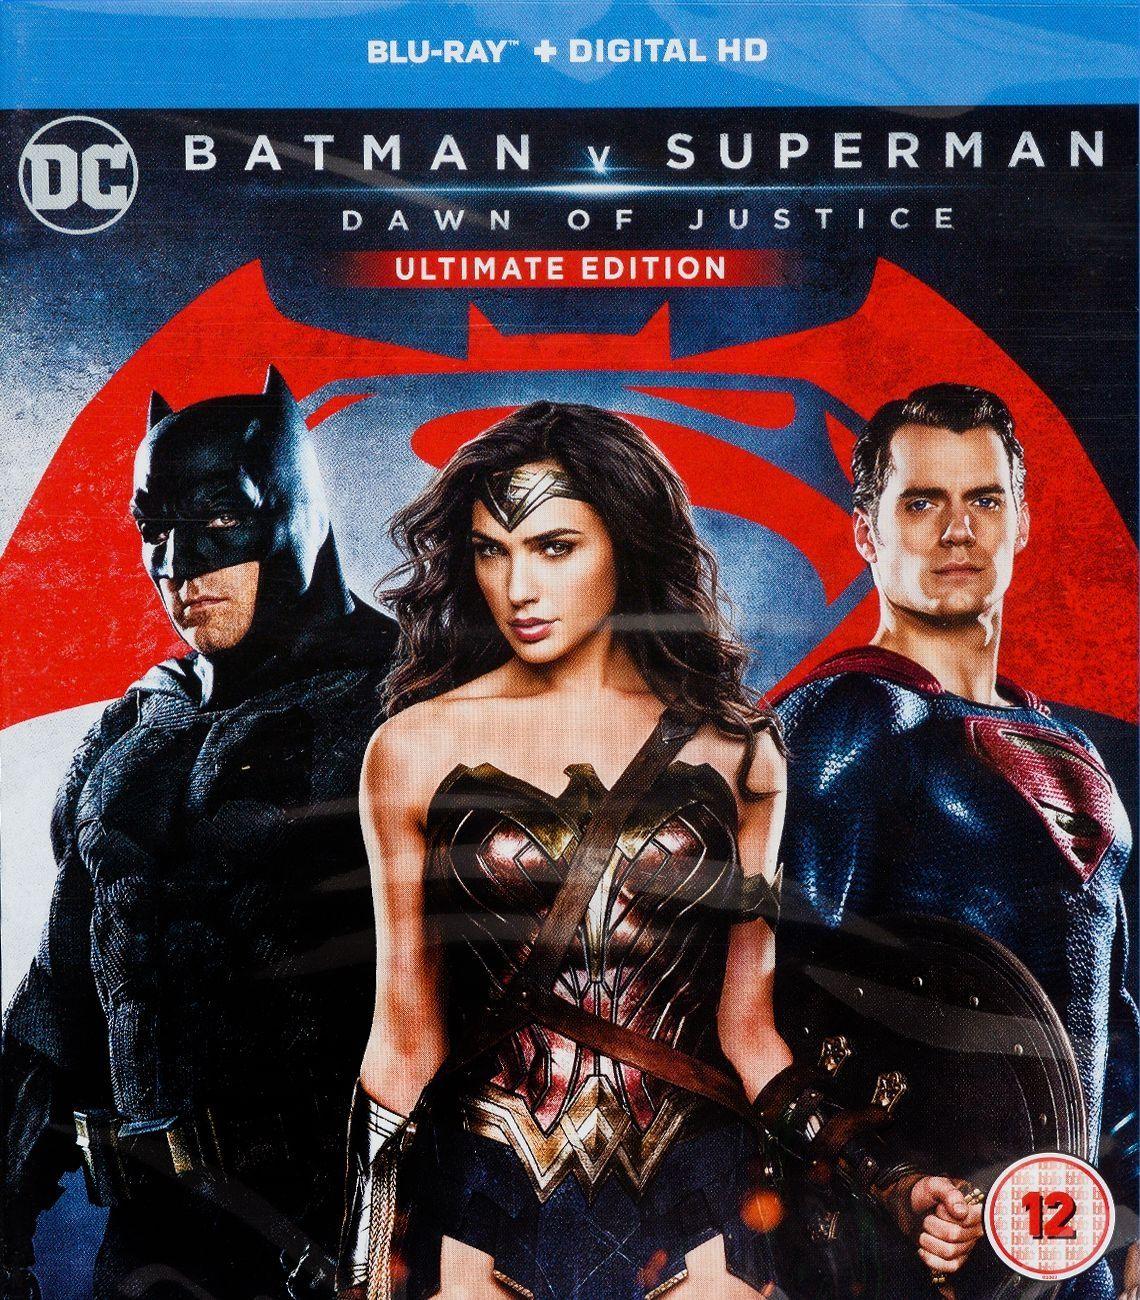 Batman V Superman: Dawn Of Justice Ultimate Edition (Blu-Ray) - 1